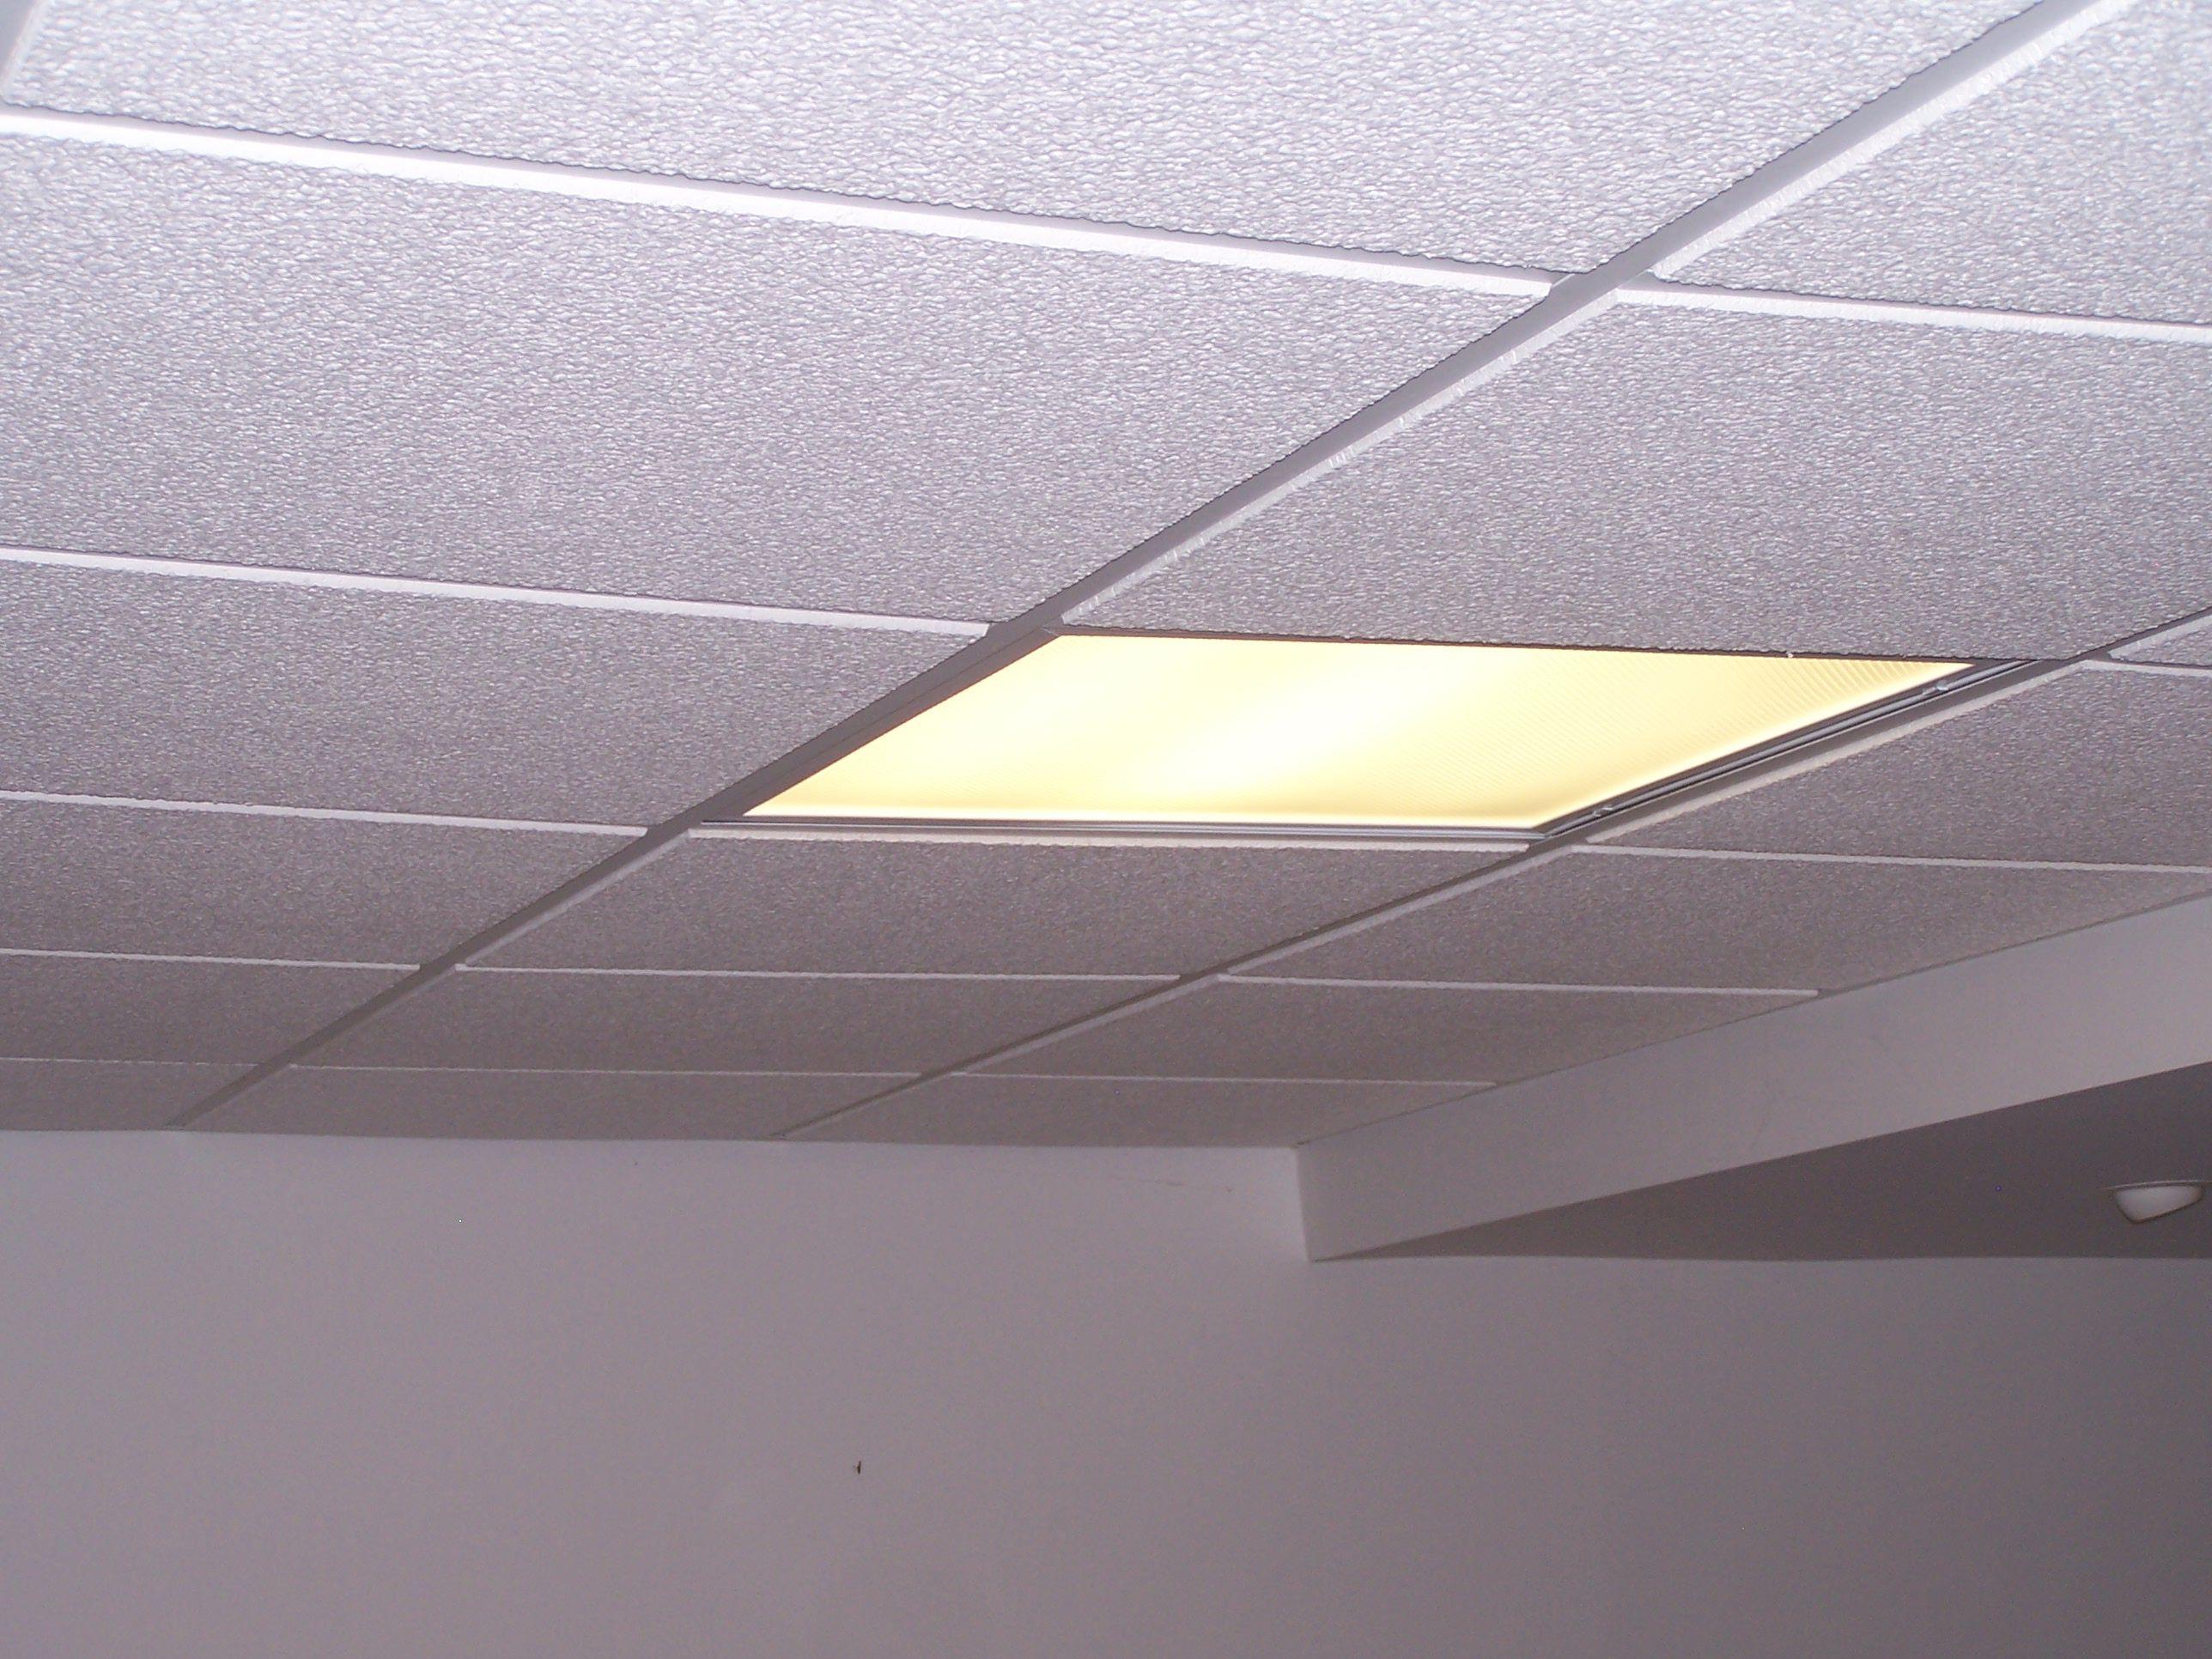 Drop ceiling fluorescent light fixtures 22 http drop ceiling fluorescent light fixtures 22 arubaitofo Gallery